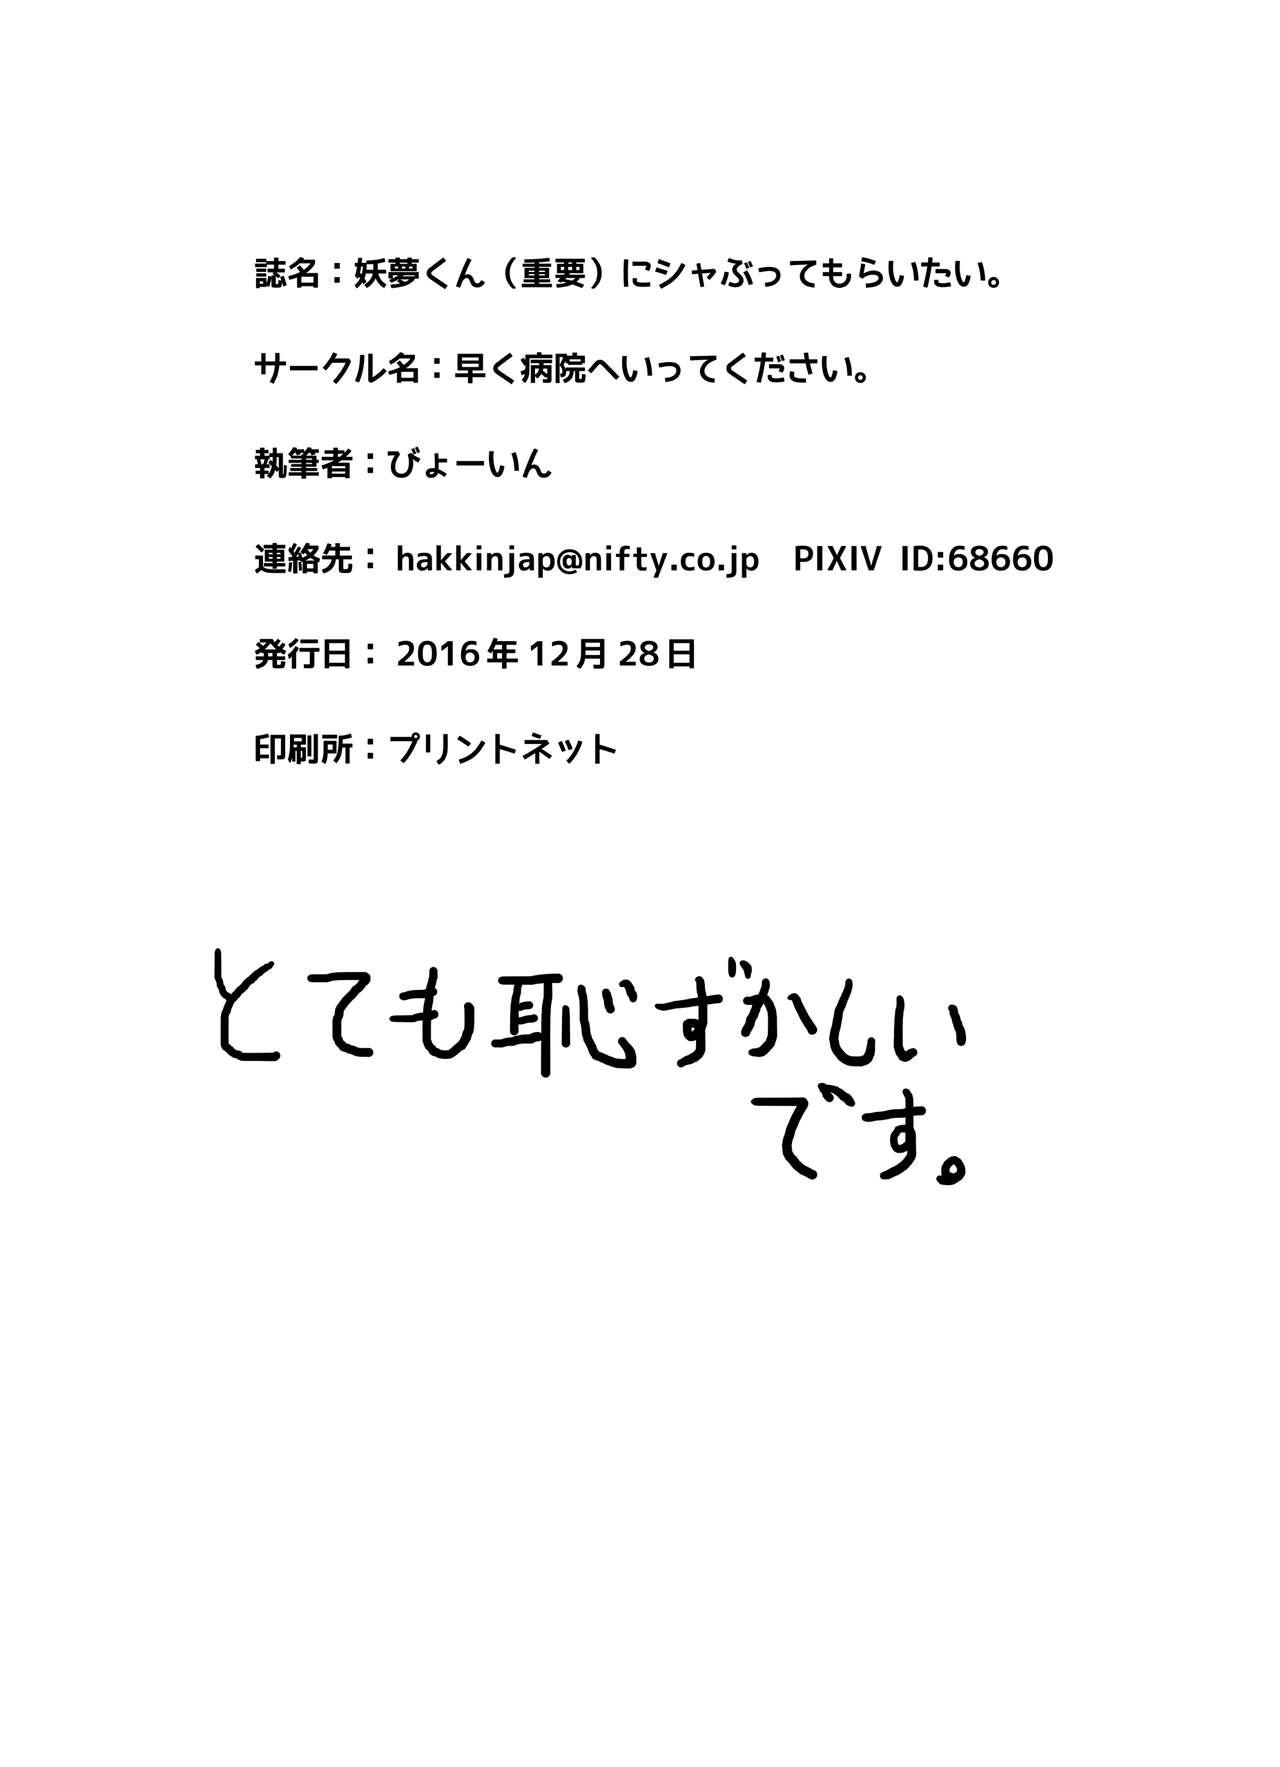 [Hayaku Byouin e Itte Kudasai. (Byoin)] Youmu-kun (Juuyou) ni Shabutte Moraitai. (Touhou Project) [Digital] 23